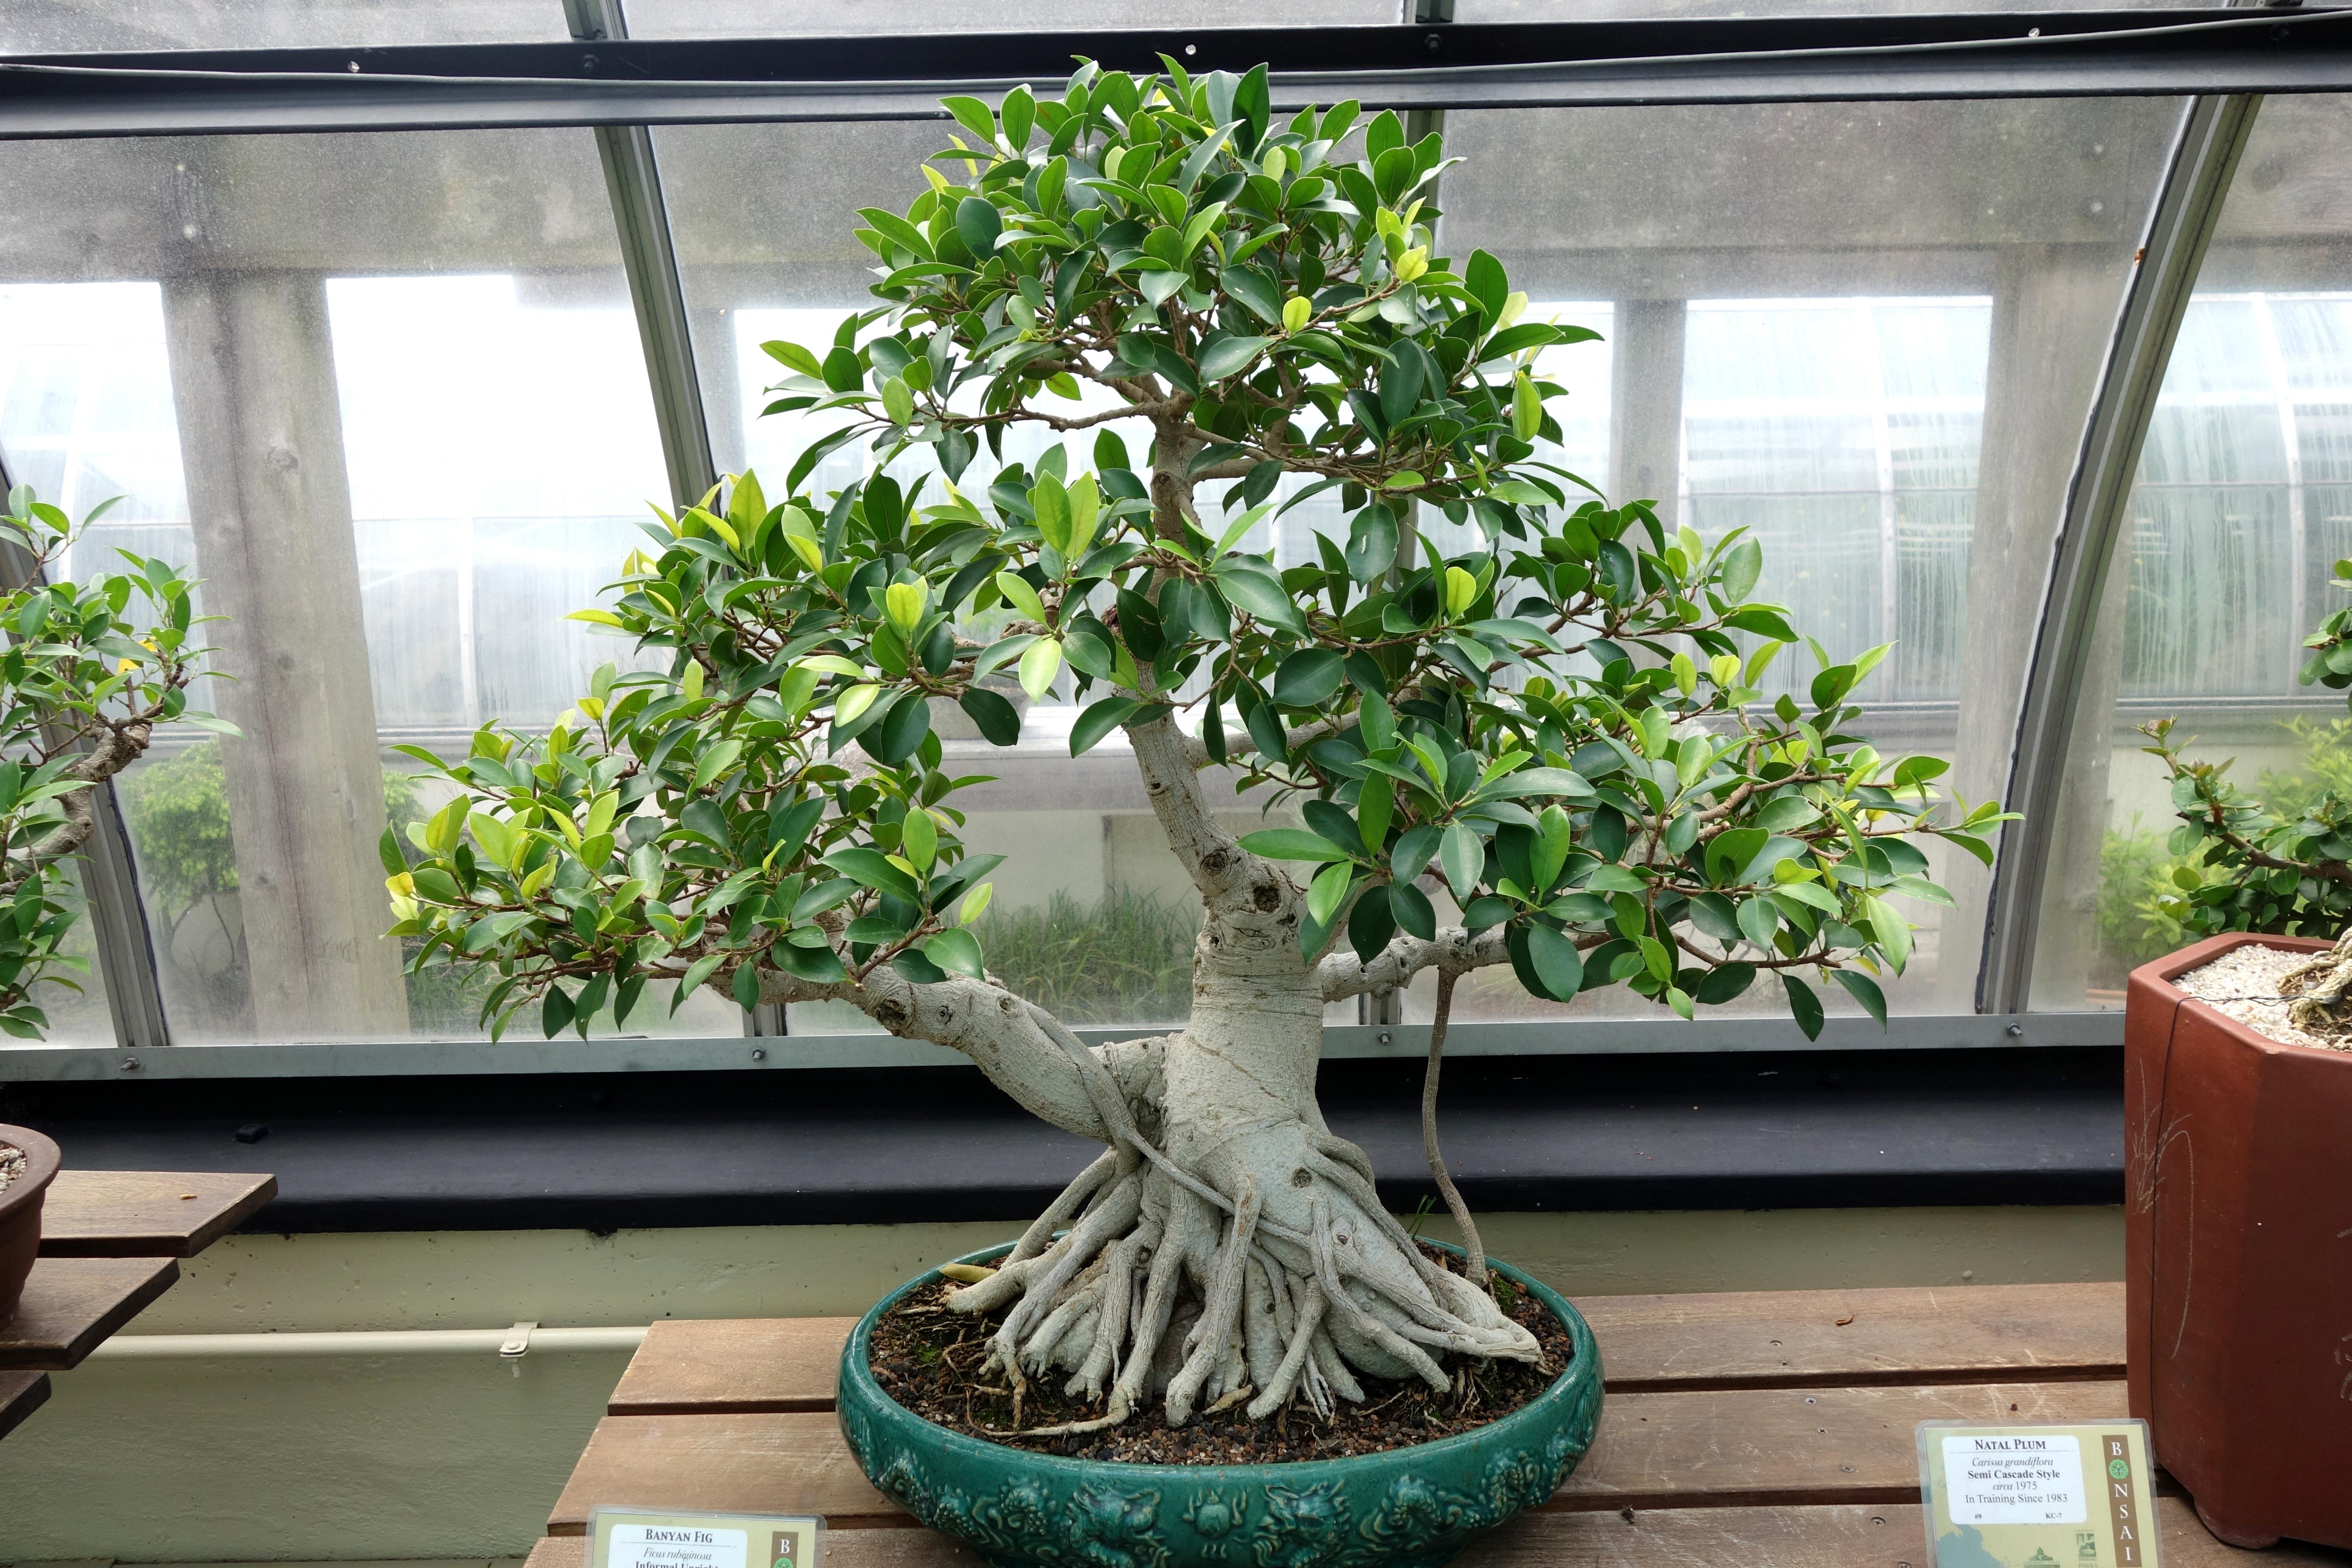 file ficus rubiginosa bonsai krohn conservatory dsc03582 jpg wikimedia commons. Black Bedroom Furniture Sets. Home Design Ideas